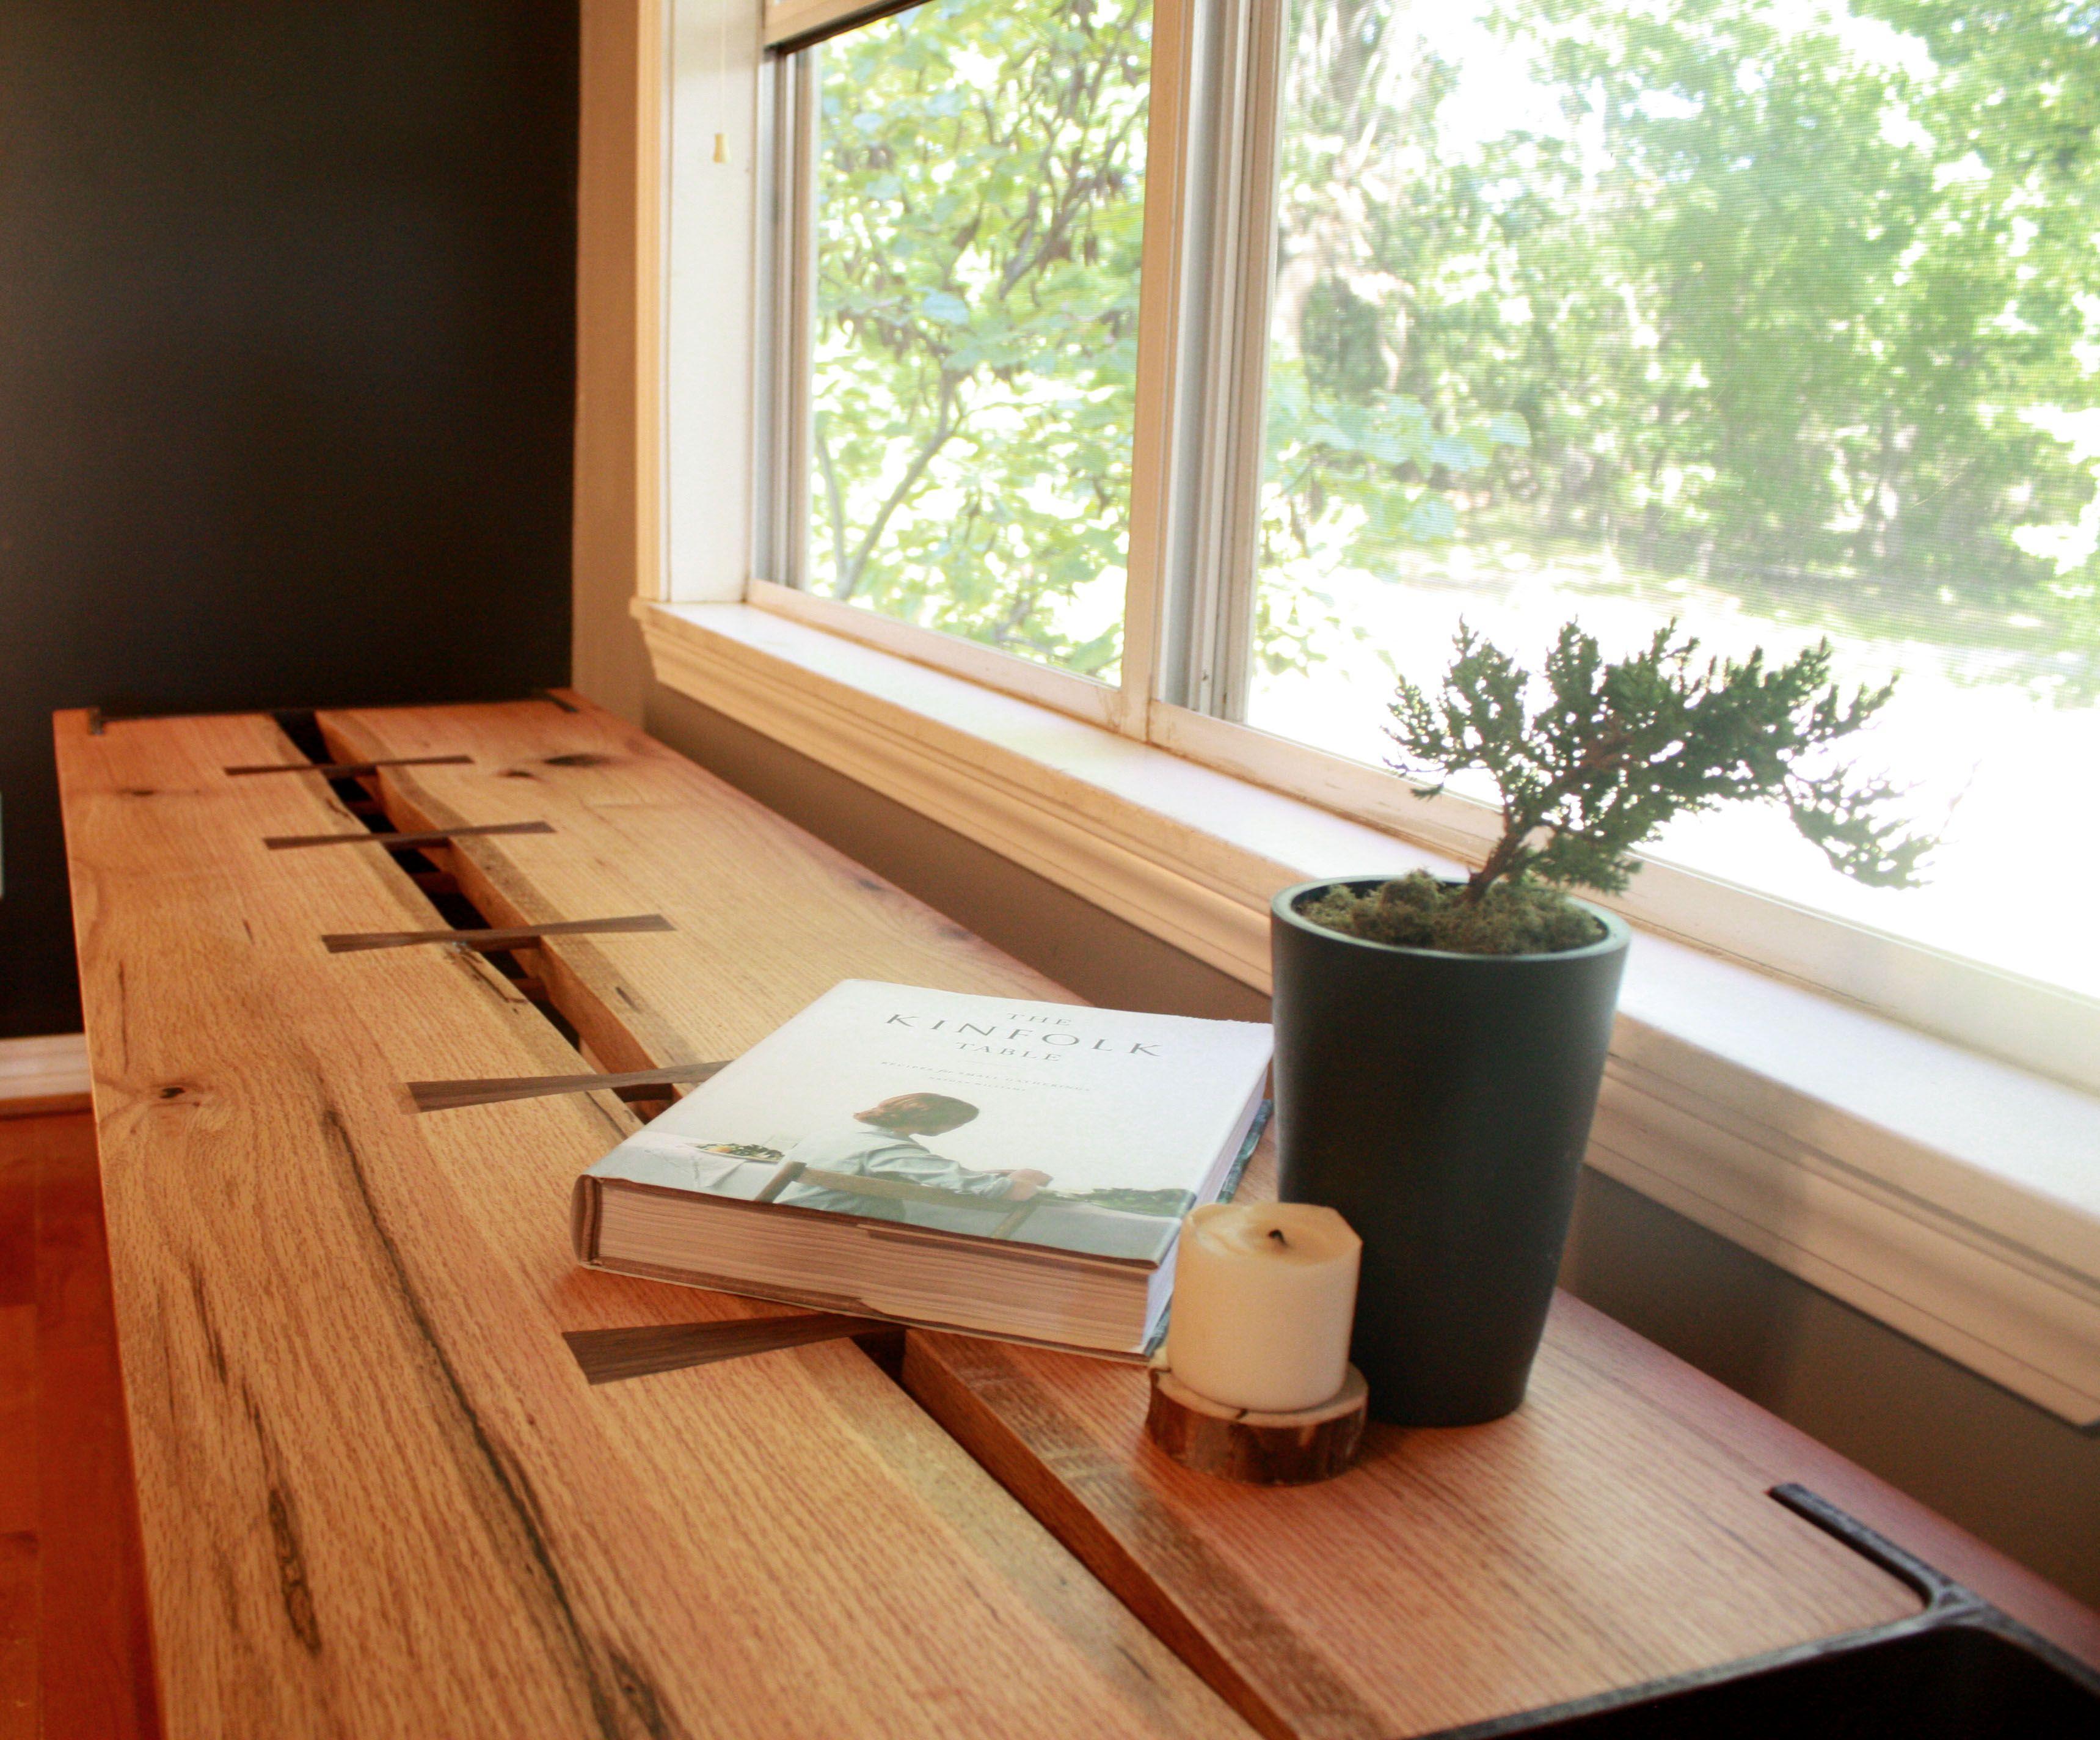 Hand Made Live Edge Oak Window Bench With Salvaged I Beam